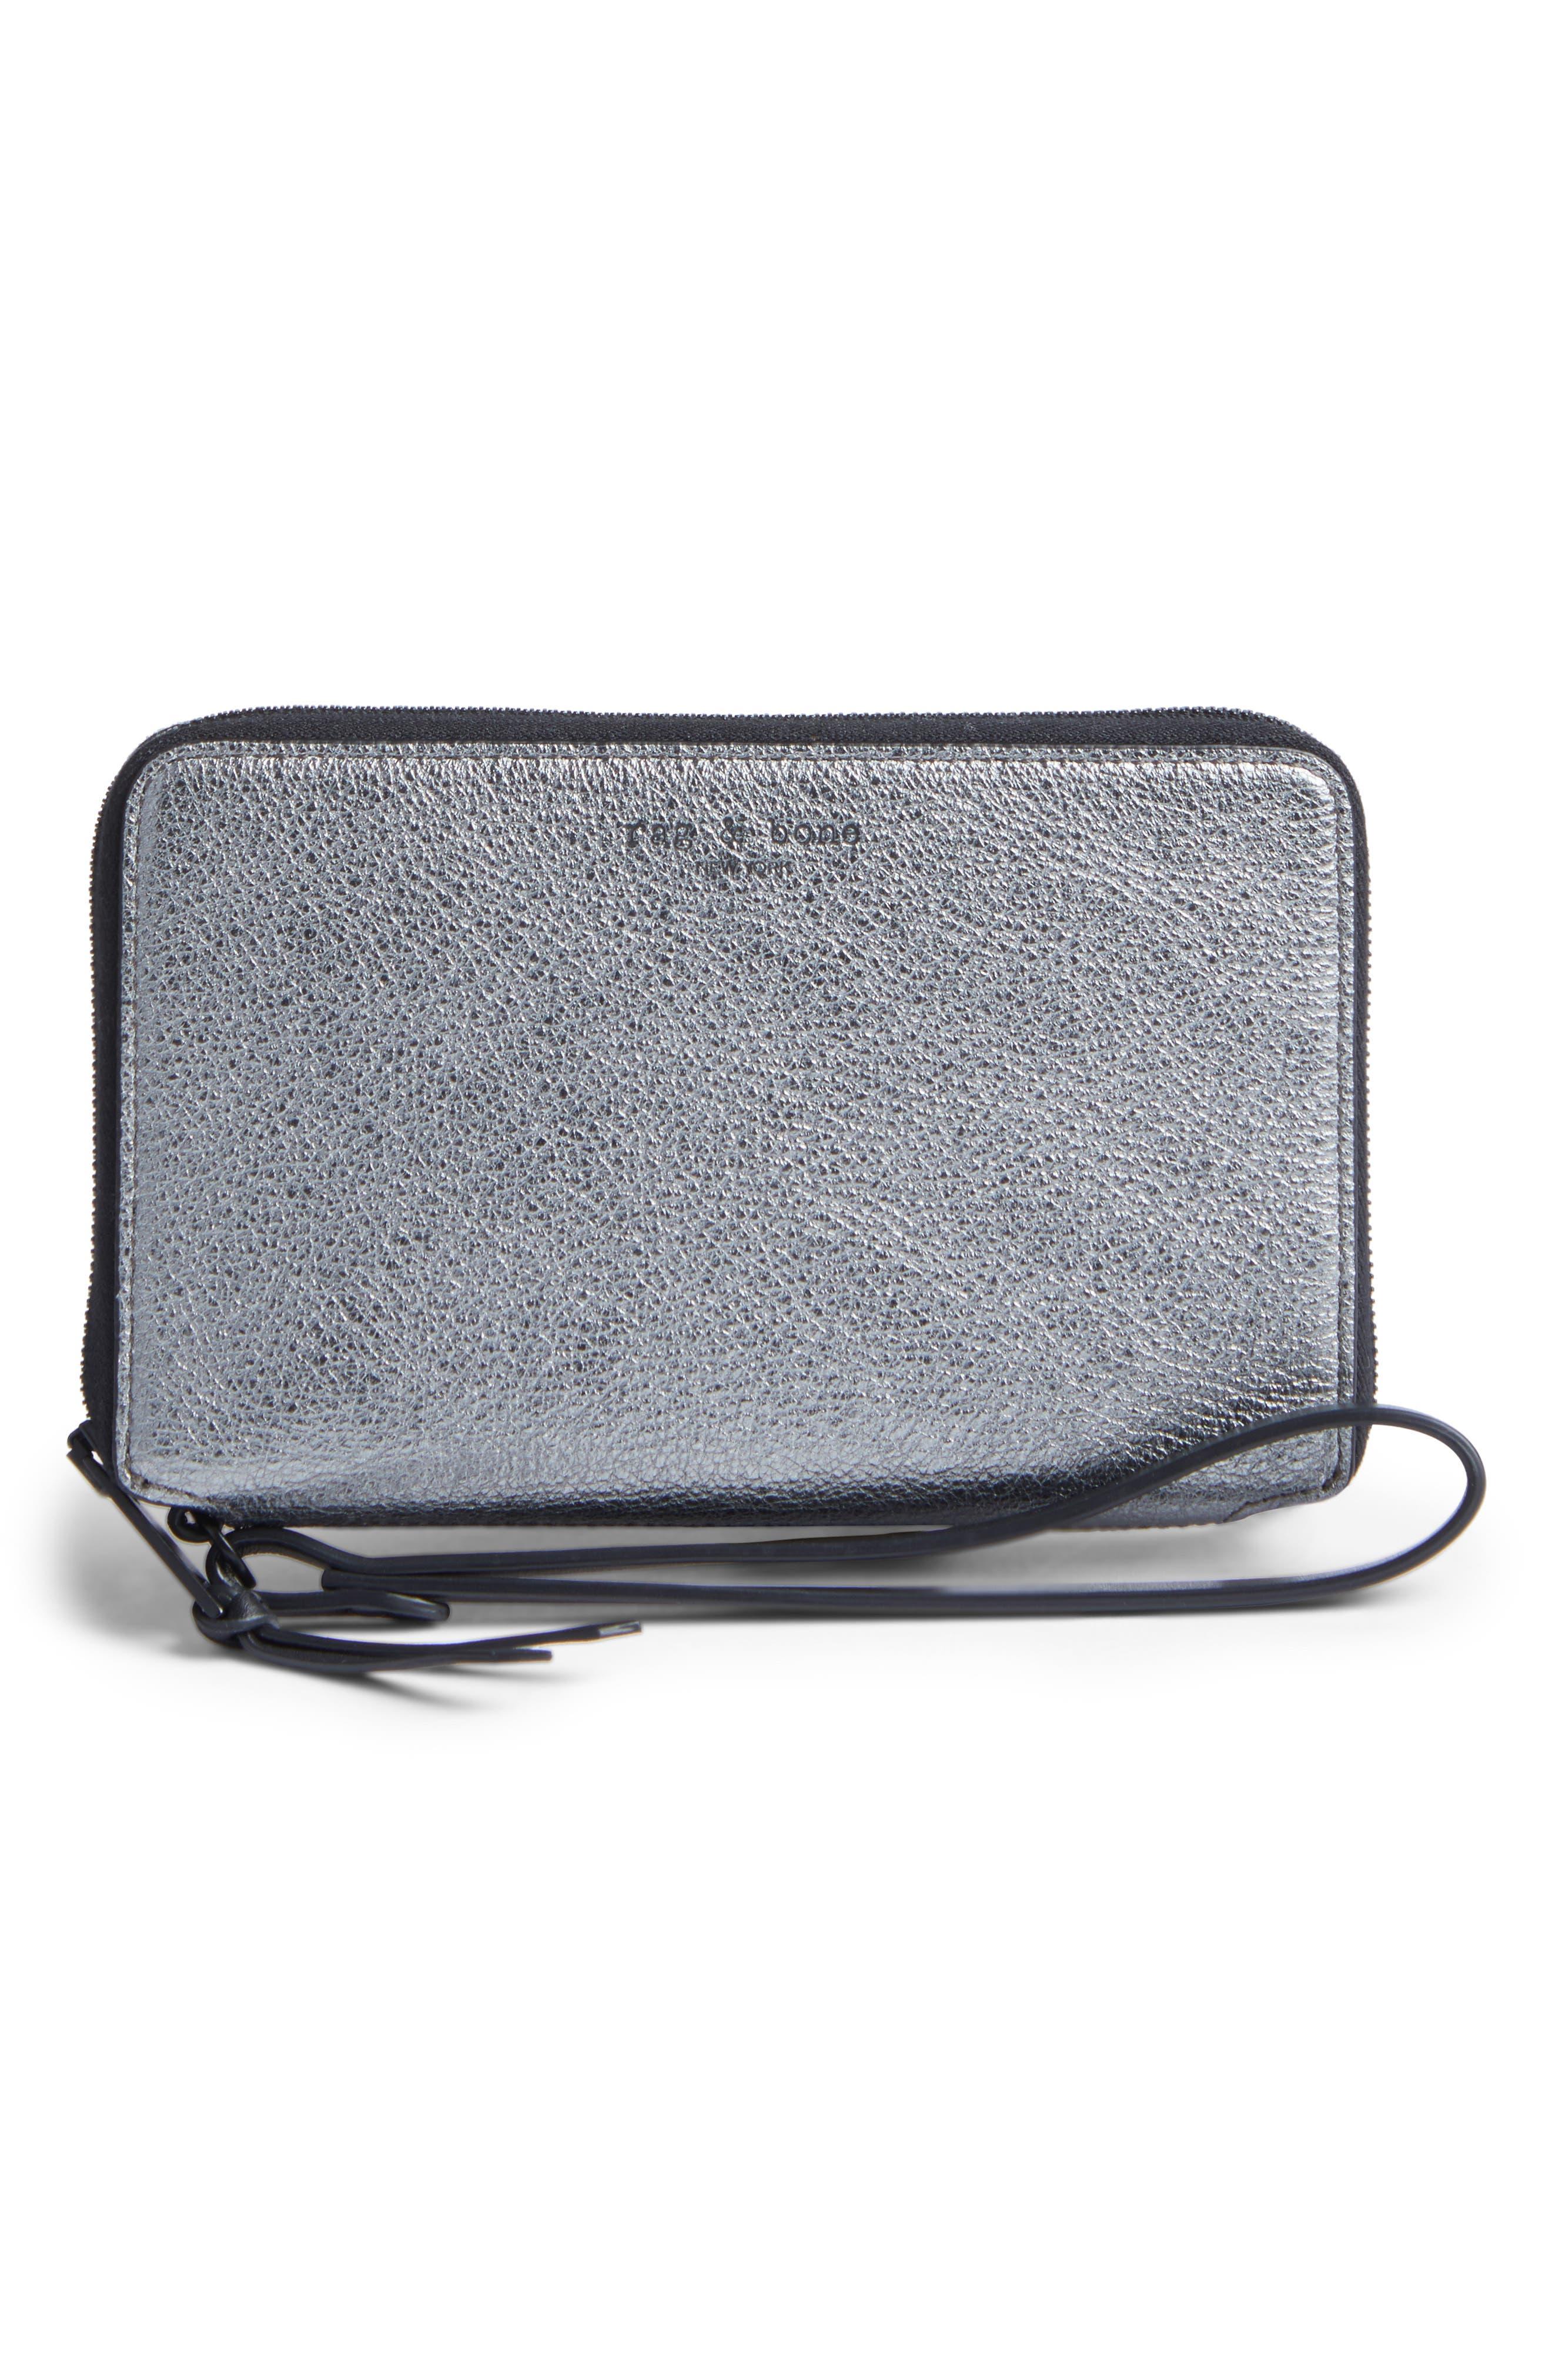 Devon Metallic Buffalo Leather Phone Wallet,                         Main,                         color, Gunmetal